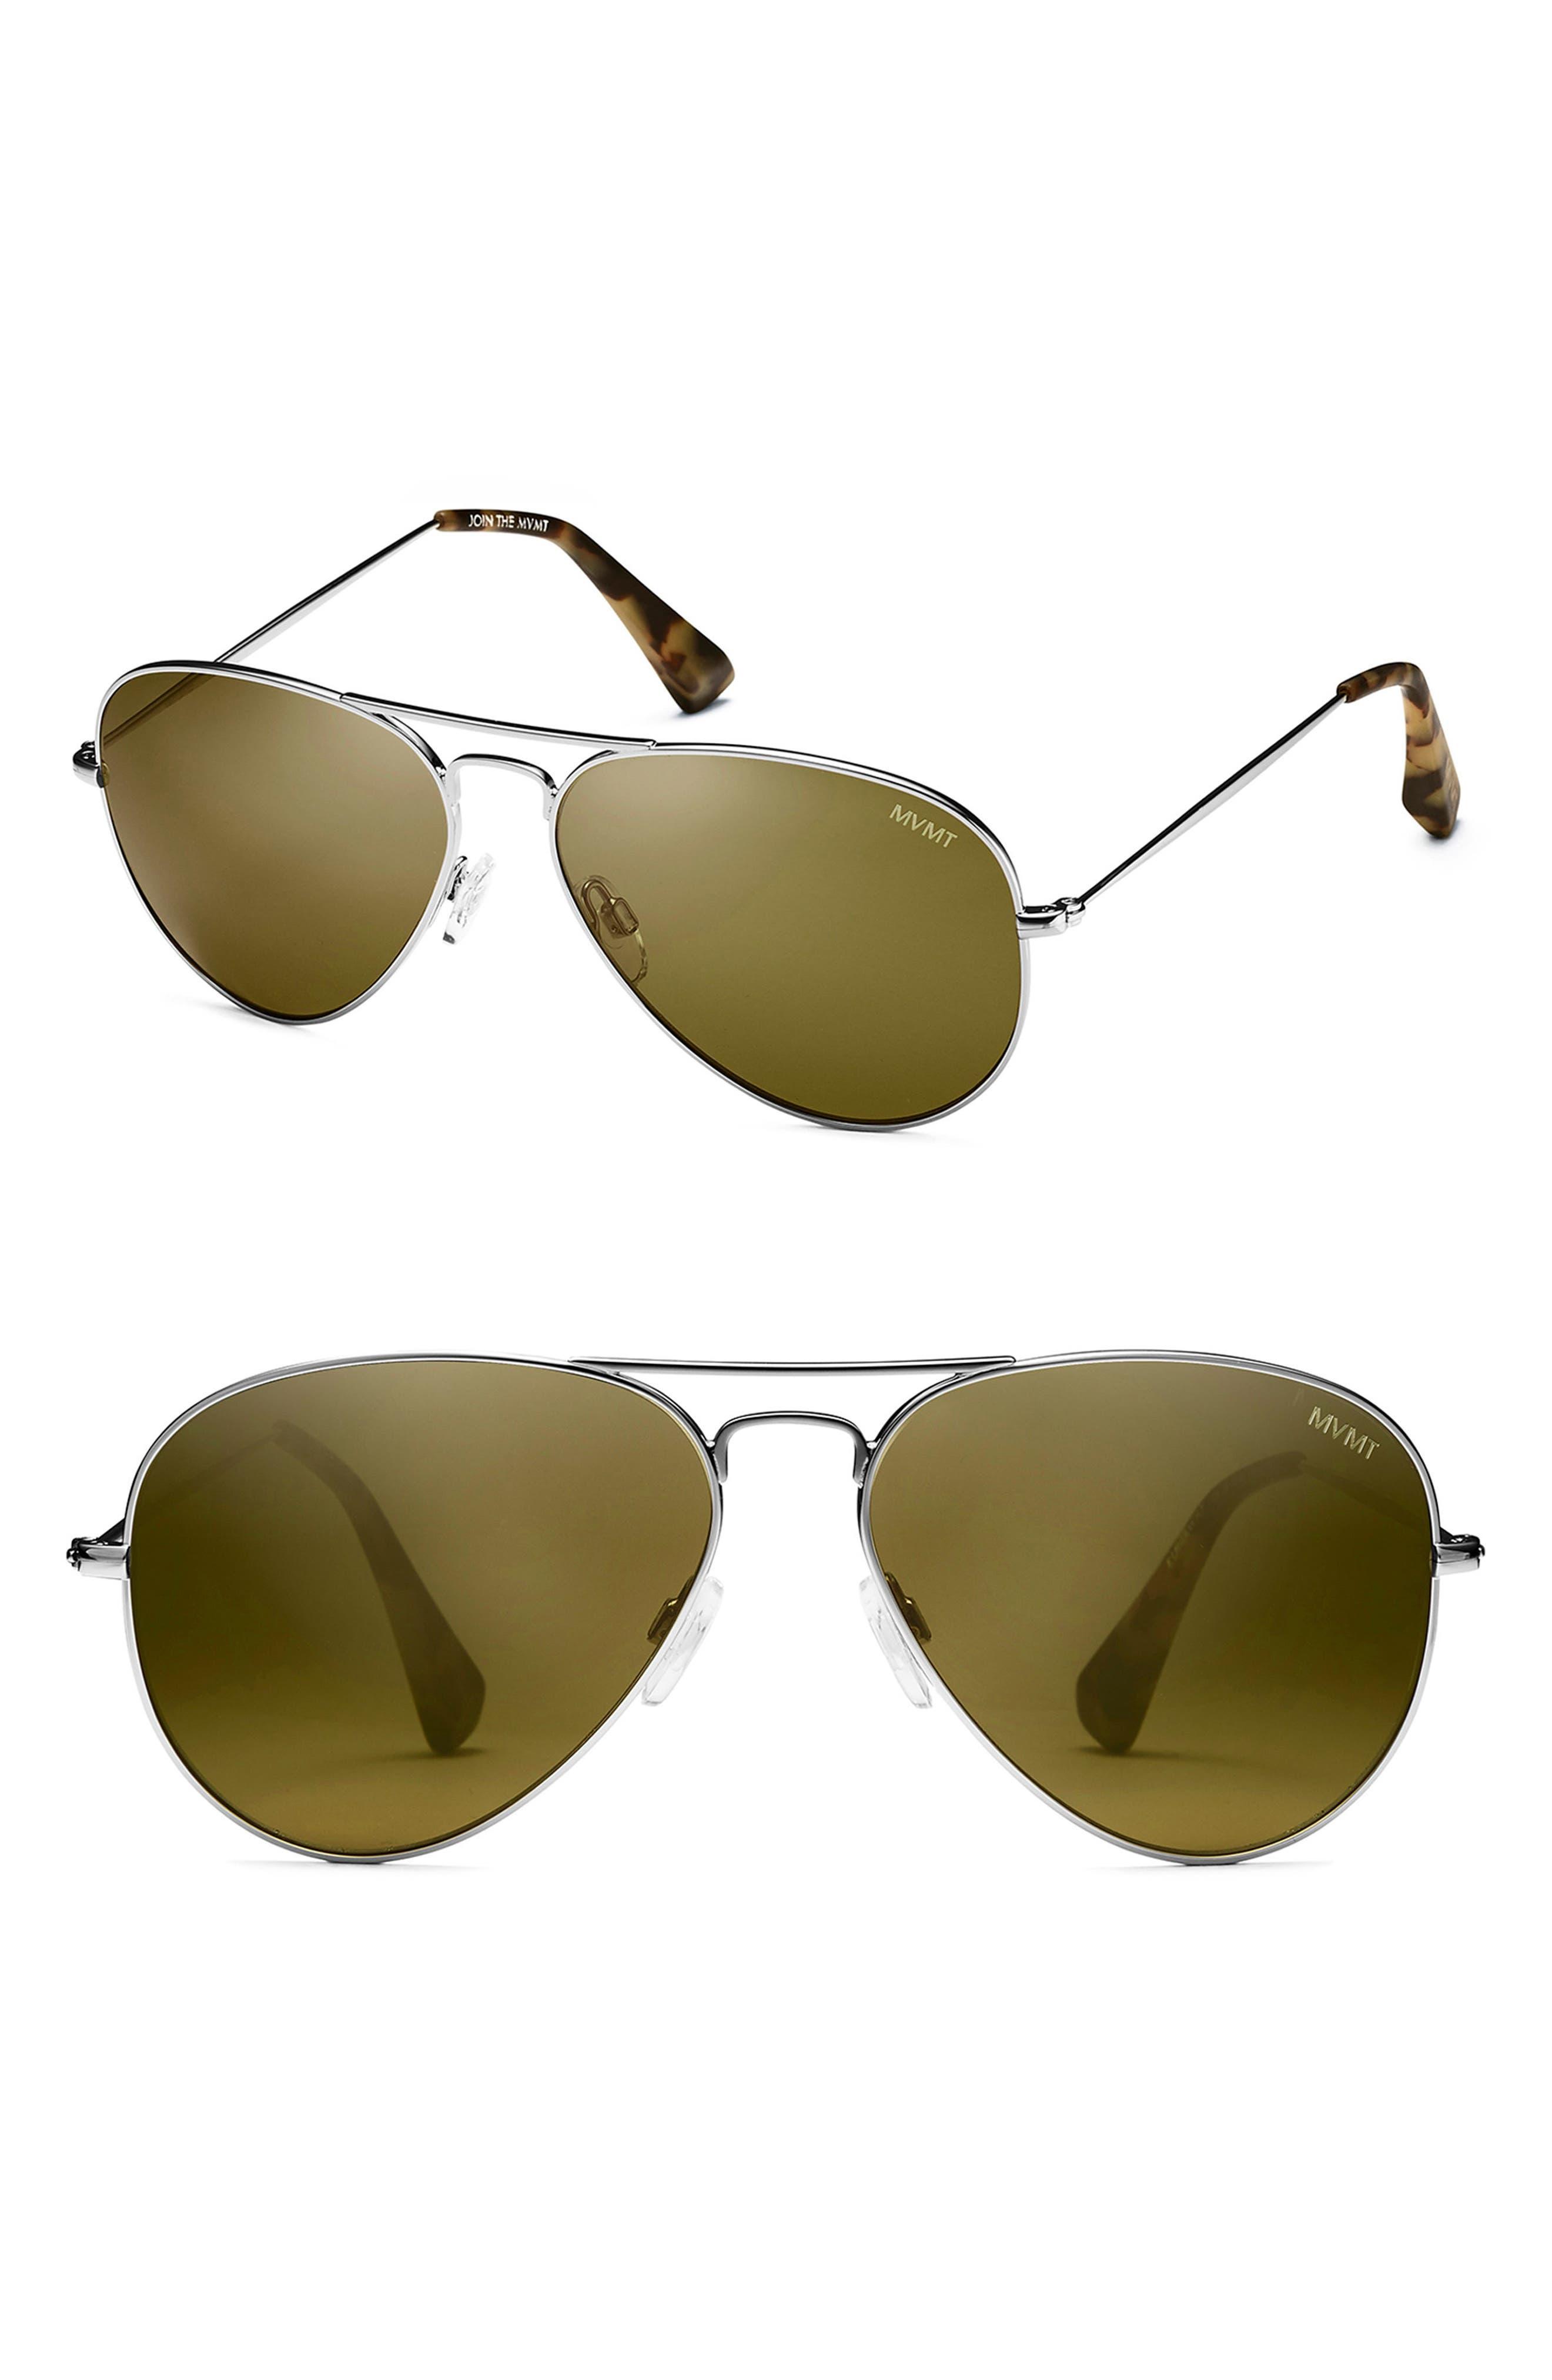 Runway 60mm Polarized Aviator Sunglasses,                             Main thumbnail 1, color,                             Brushed Silver